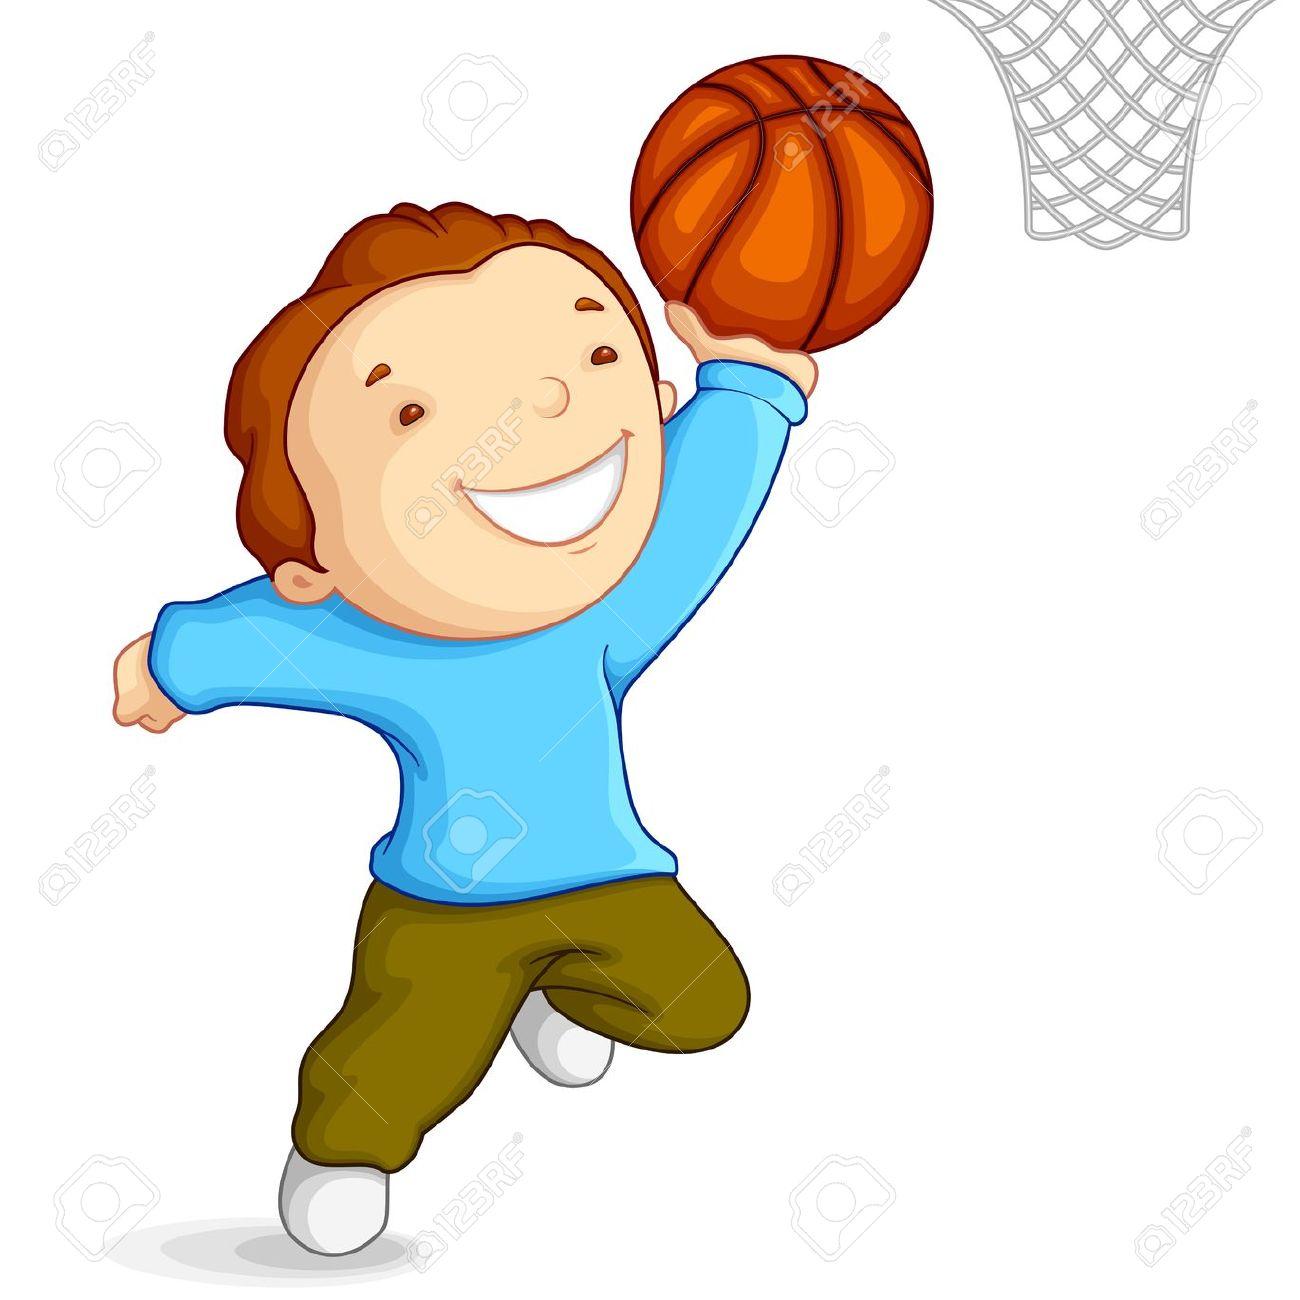 1300x1300 Boy Clipart Play Basketball